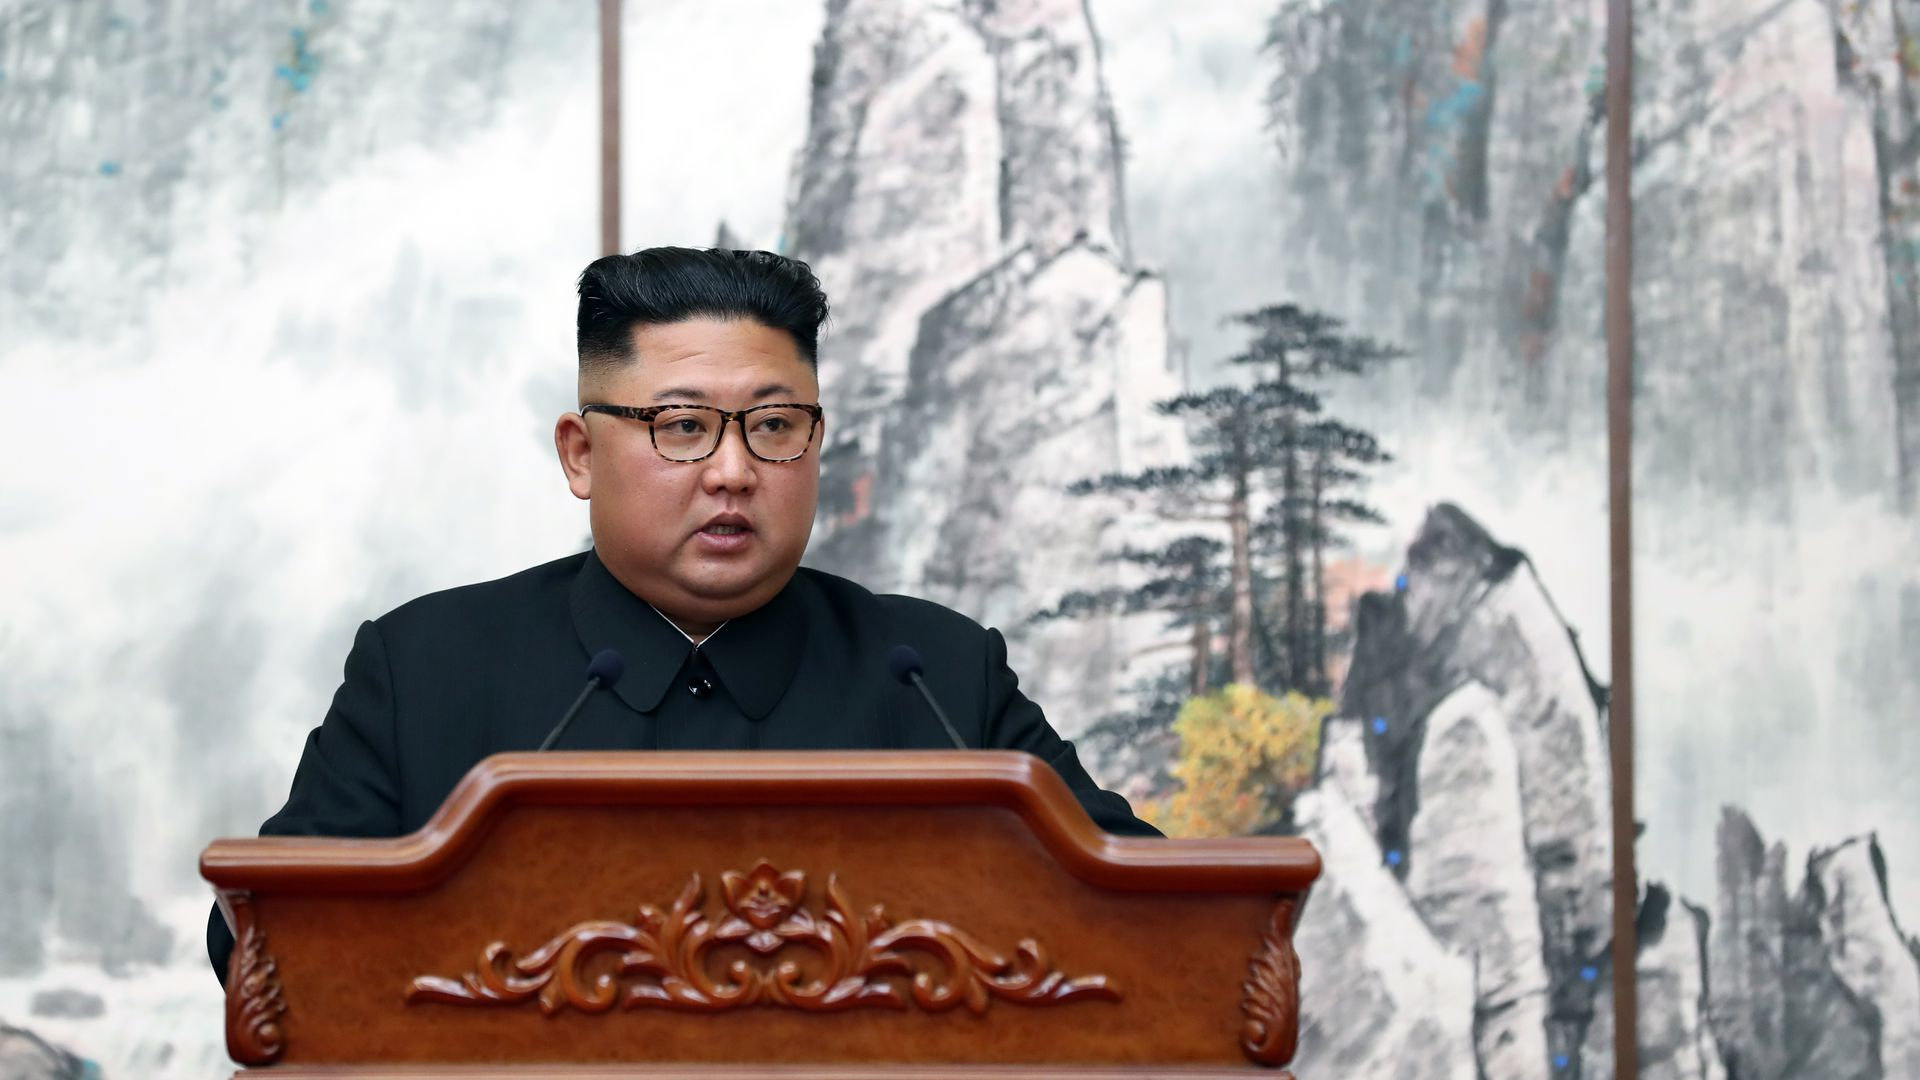 North Korean leader Kim Jong-Un speaking at a podium